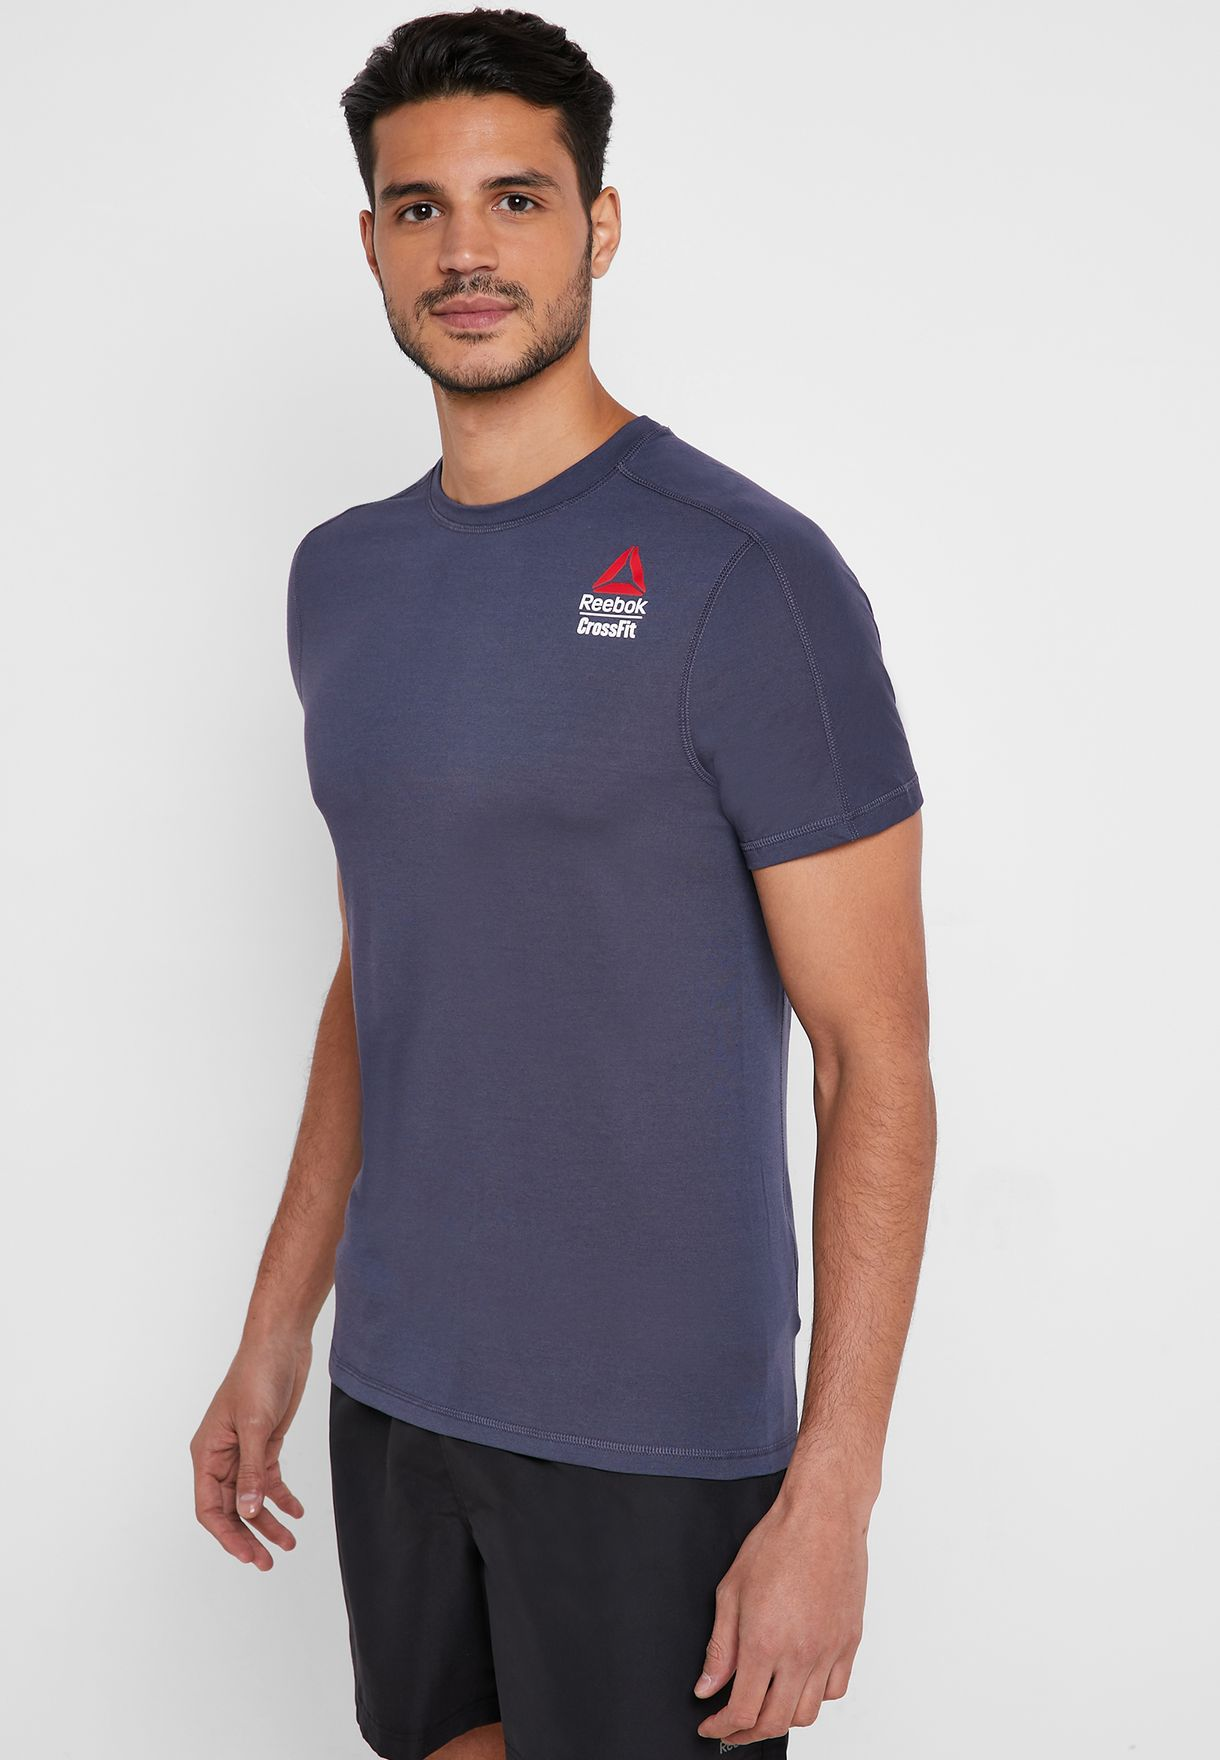 reebok crossfit t shirt